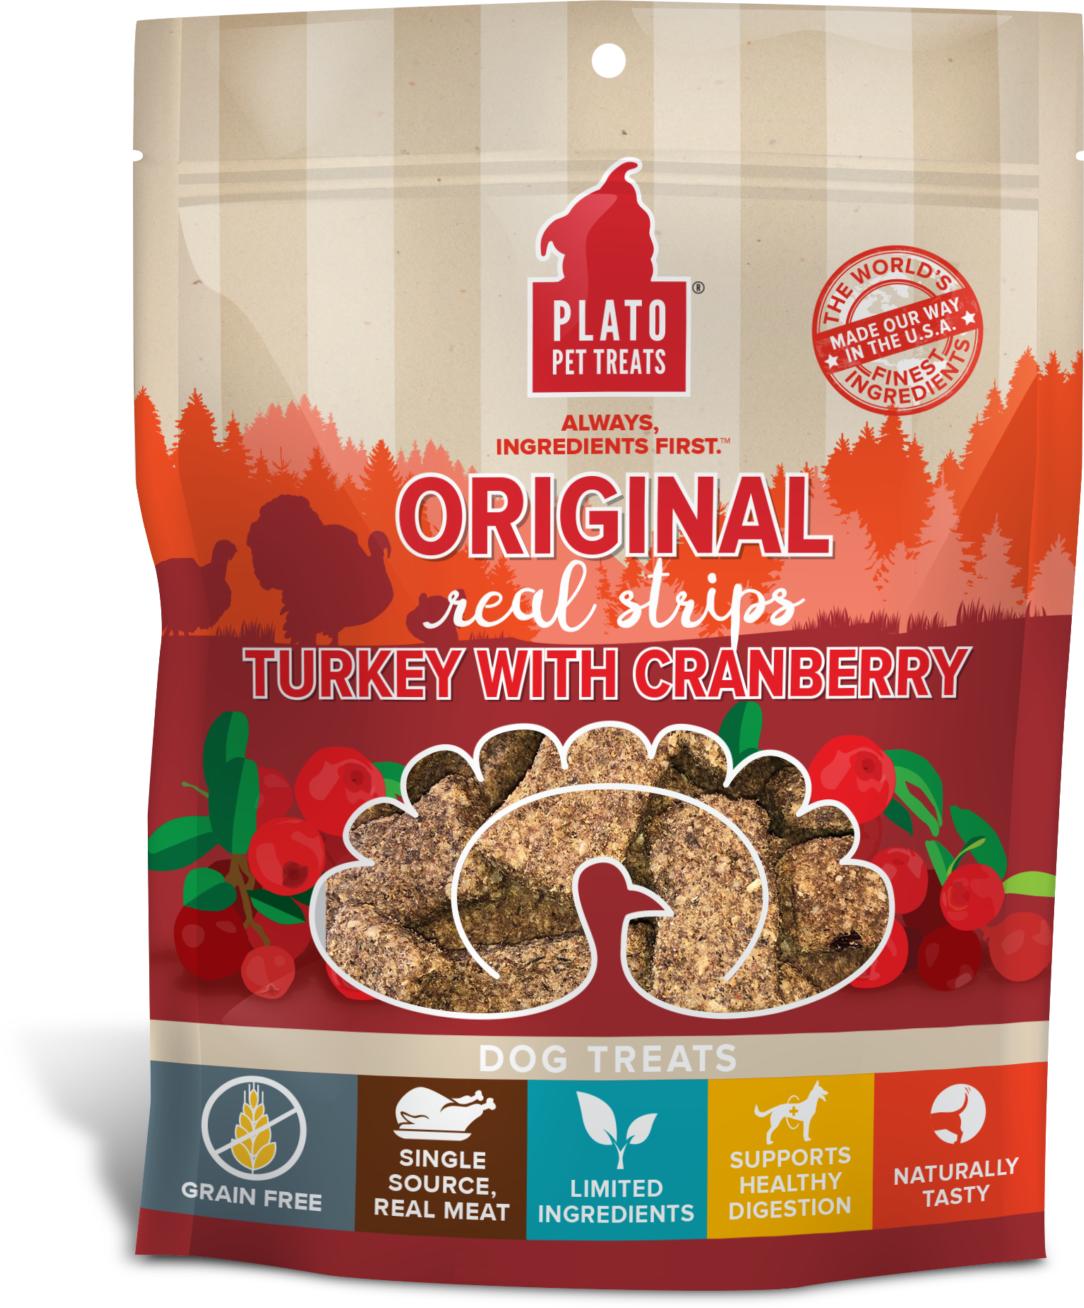 Plato Original Real Strips Turkey With Cranberry Dog Treat, 6-oz